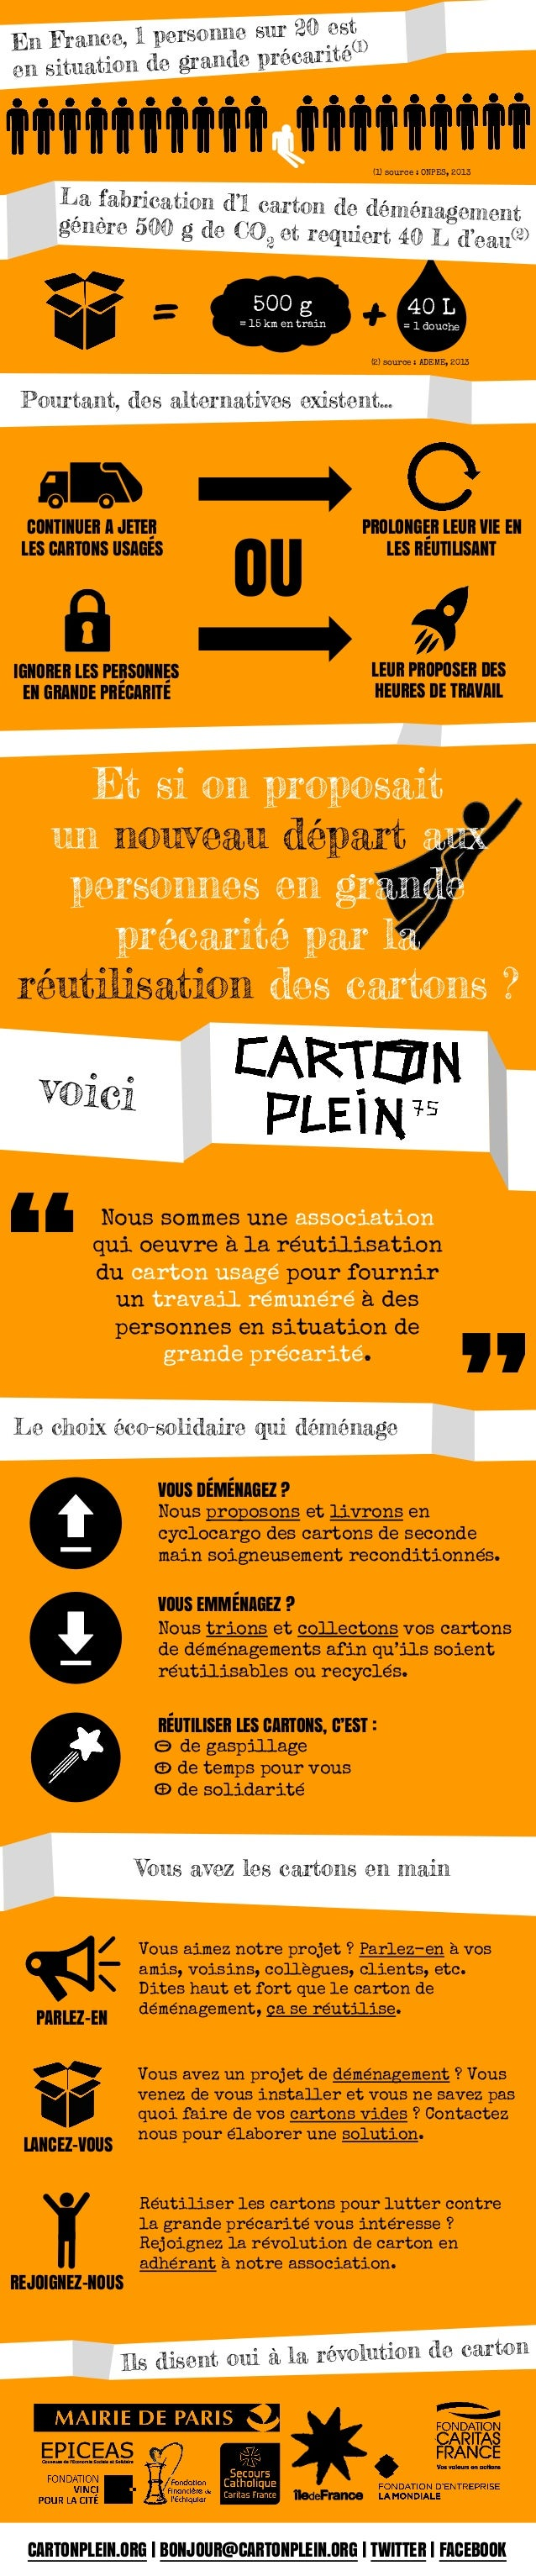 40 L = 1 douche 500 g = 15 km en train += CARTONPLEIN.ORG   BONJOUR@CARTONPLEIN.ORG   TWITTER   FACEBOOK En France, 1 pers...